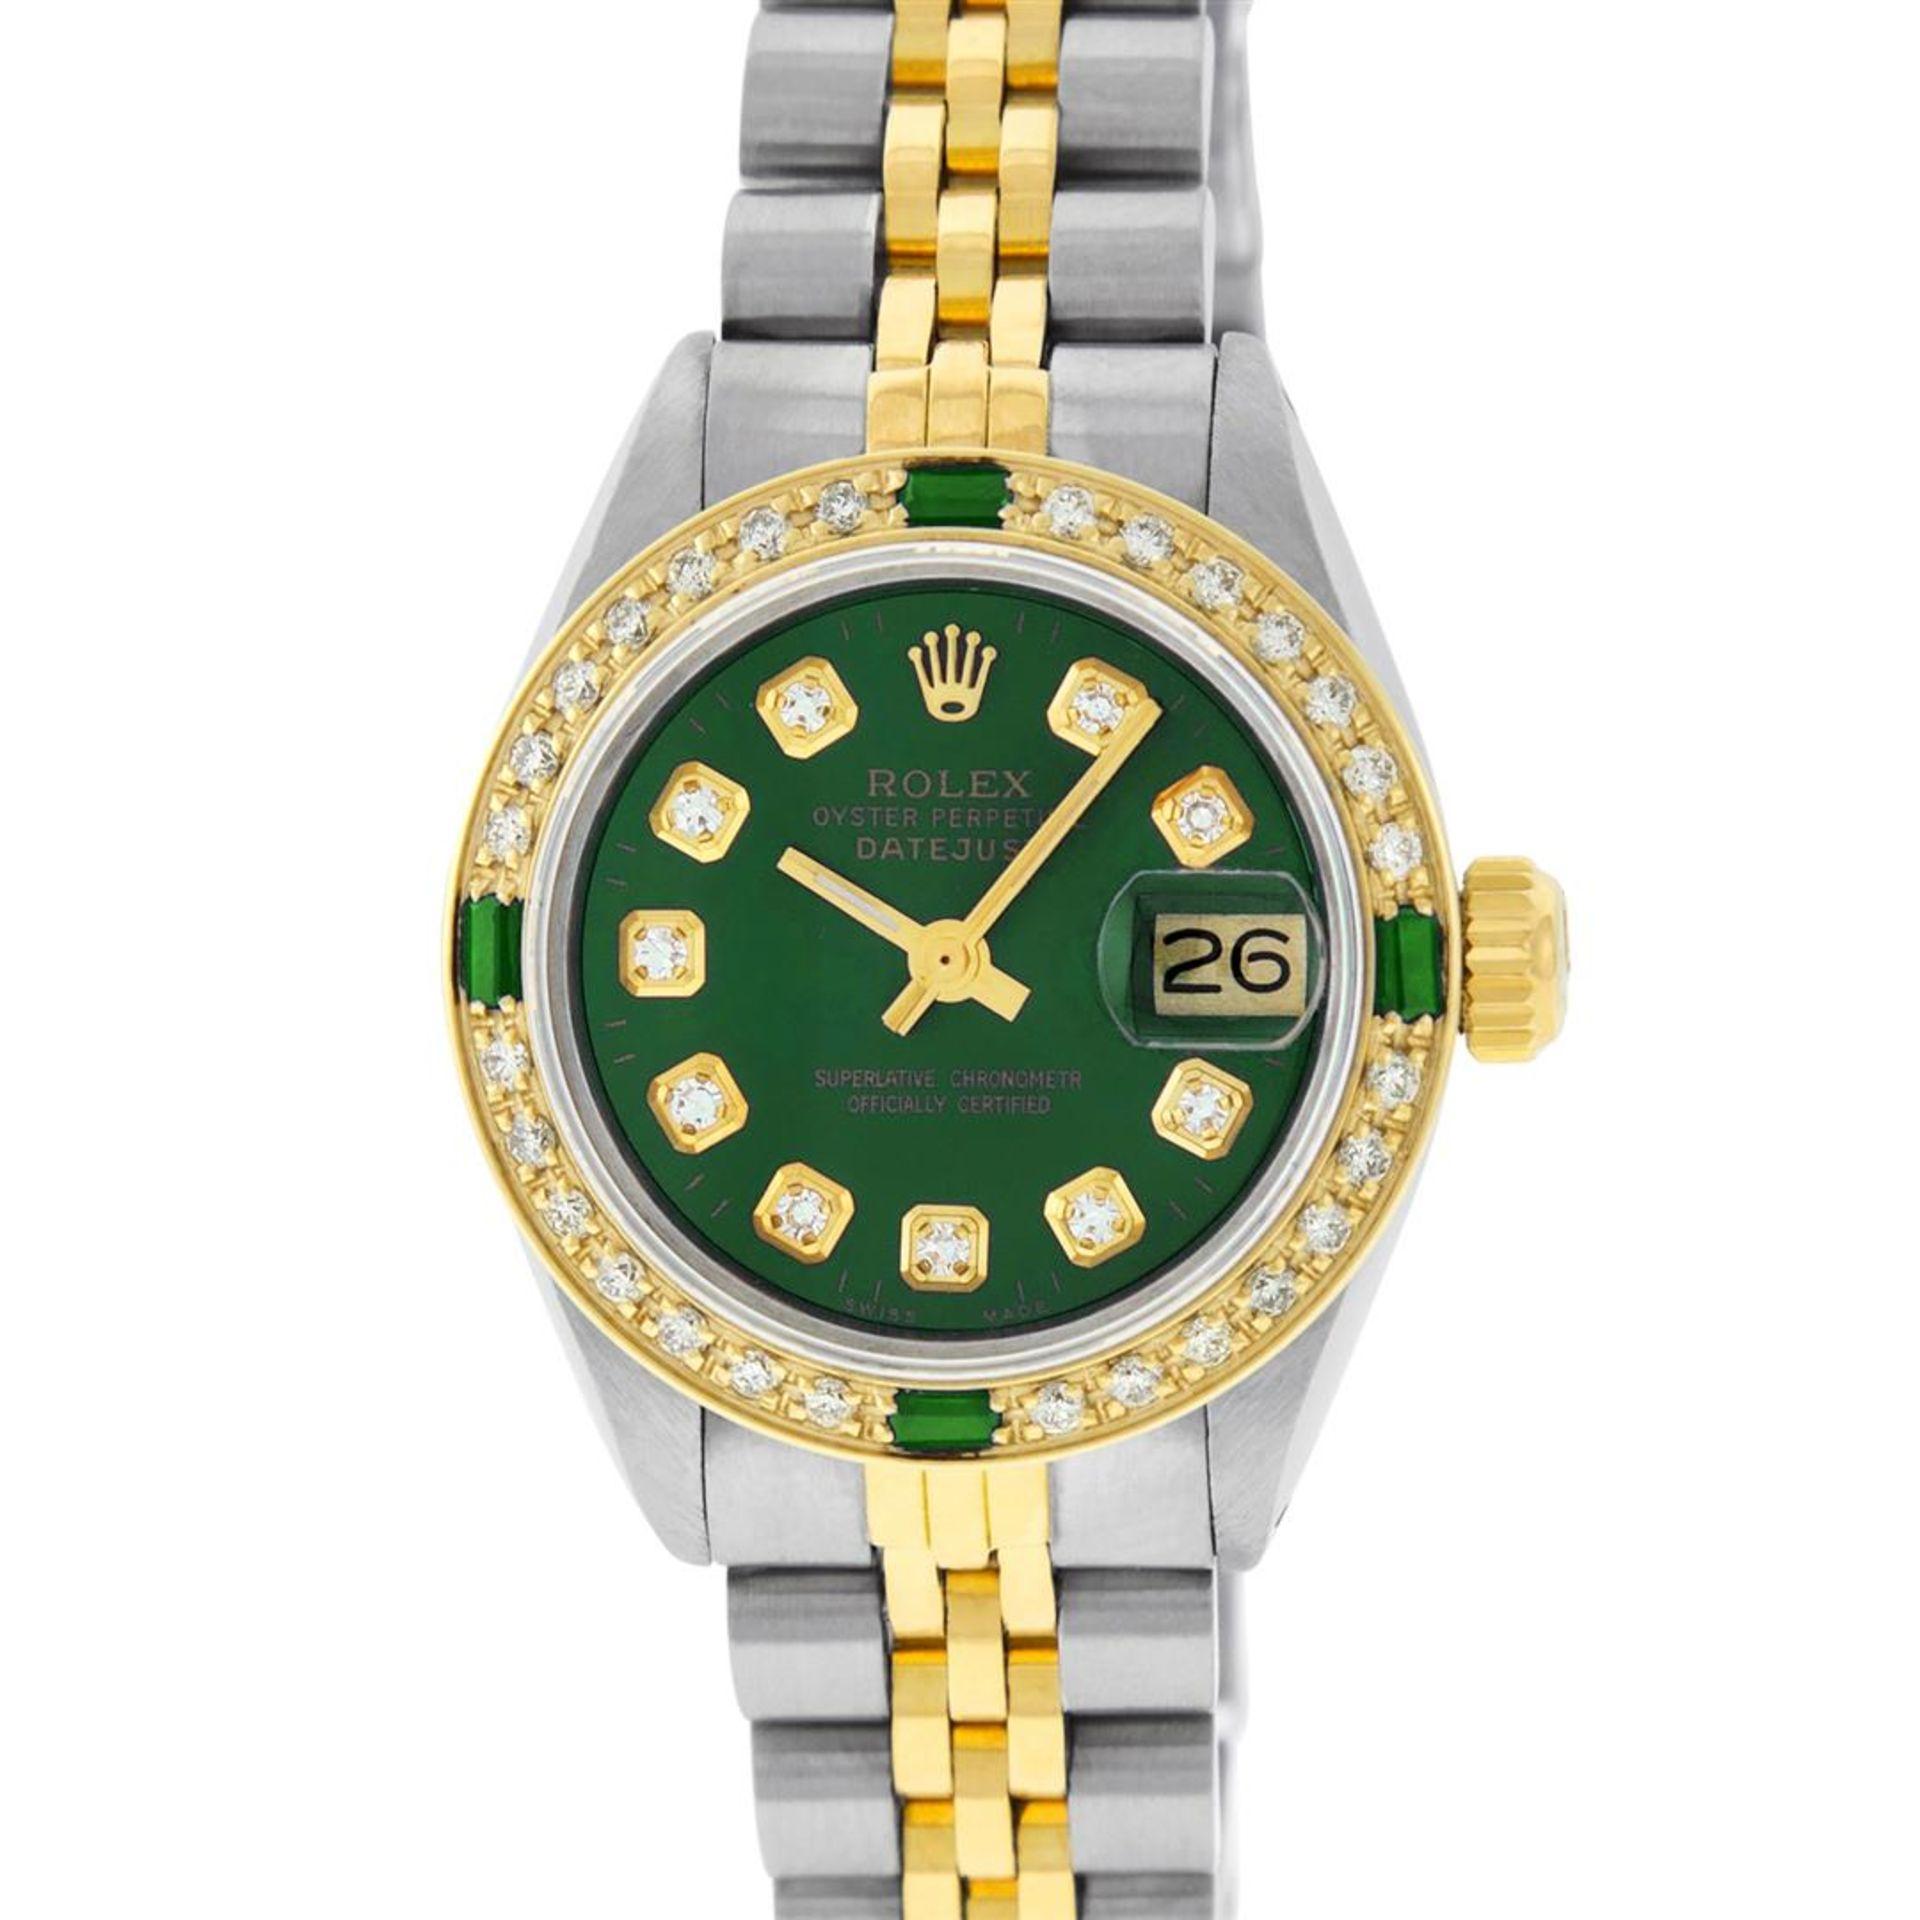 Rolex Ladies 2 Tone Green Diamond & Emerald Datejust Wristwatch - Image 3 of 9